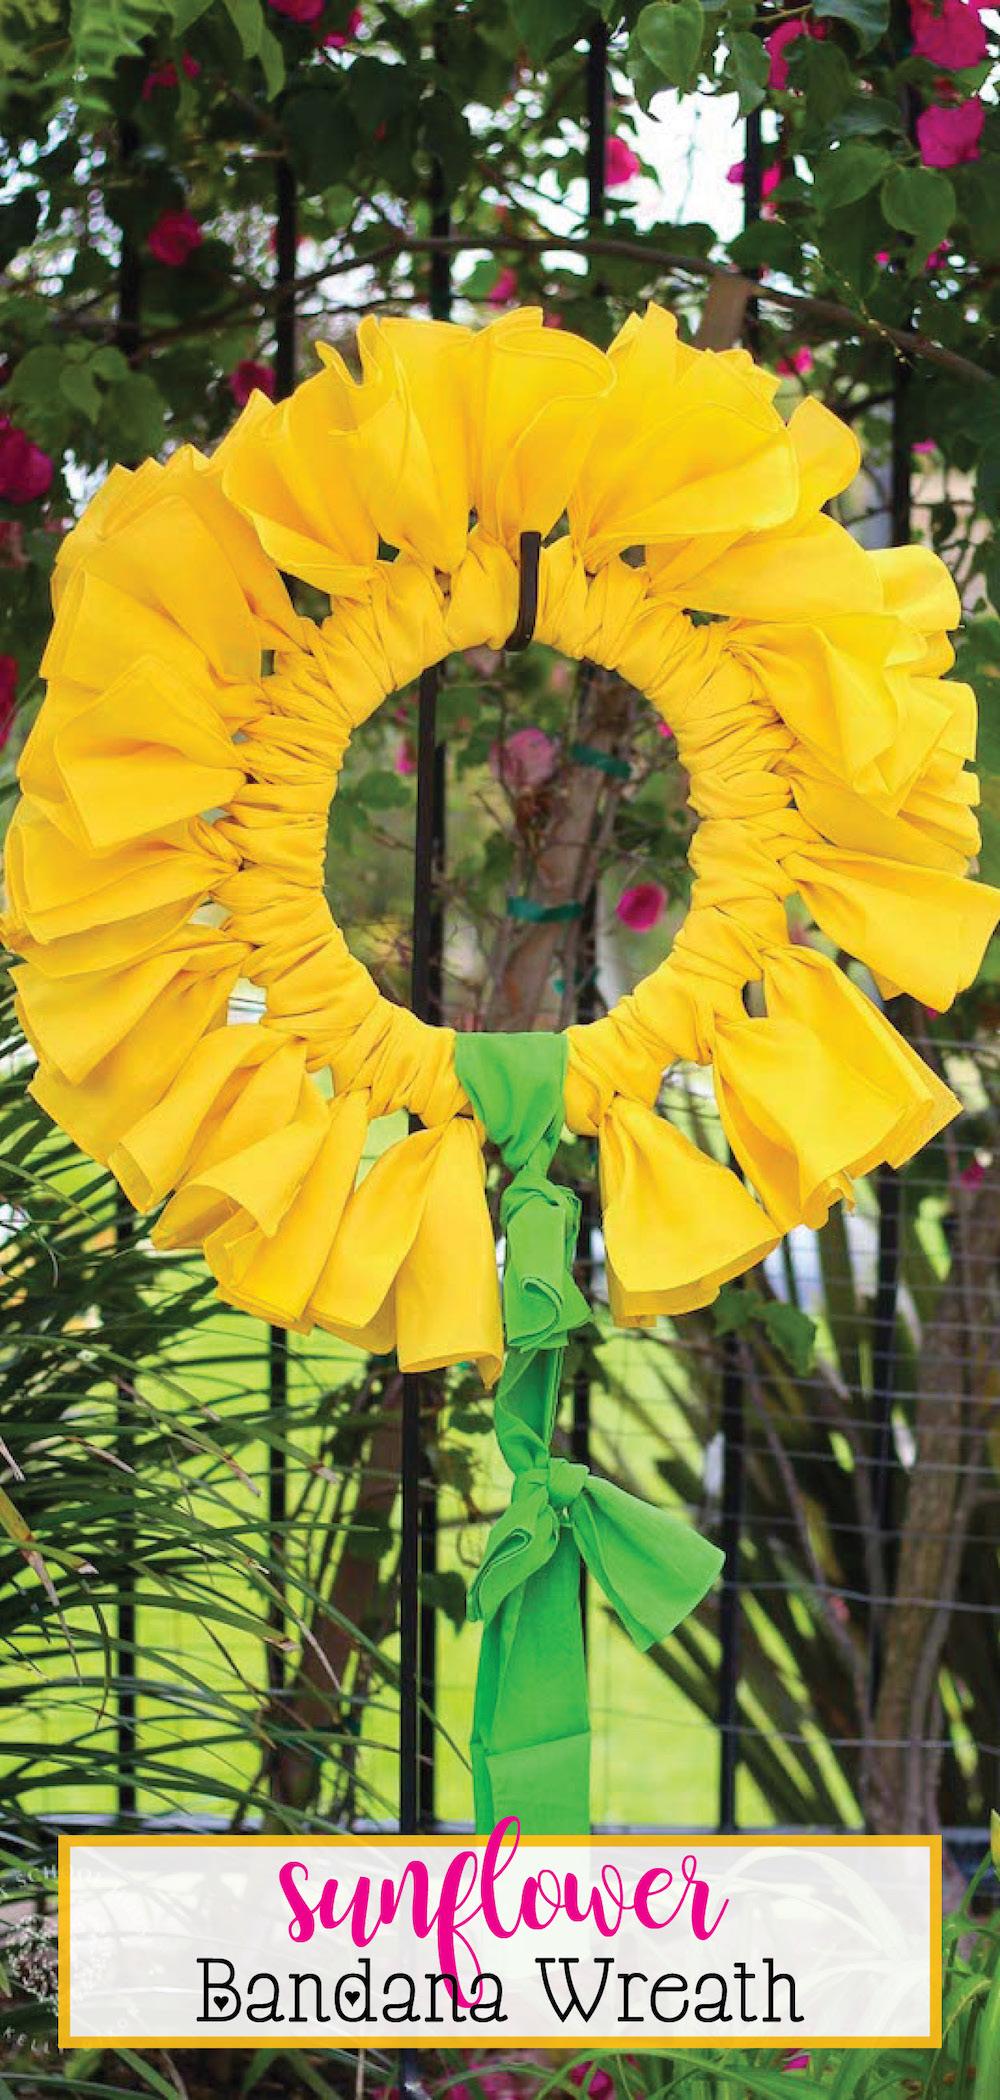 Wreath Hat Roblox The Original Sunflower Bandana Wreath Bandana Wreath Directions